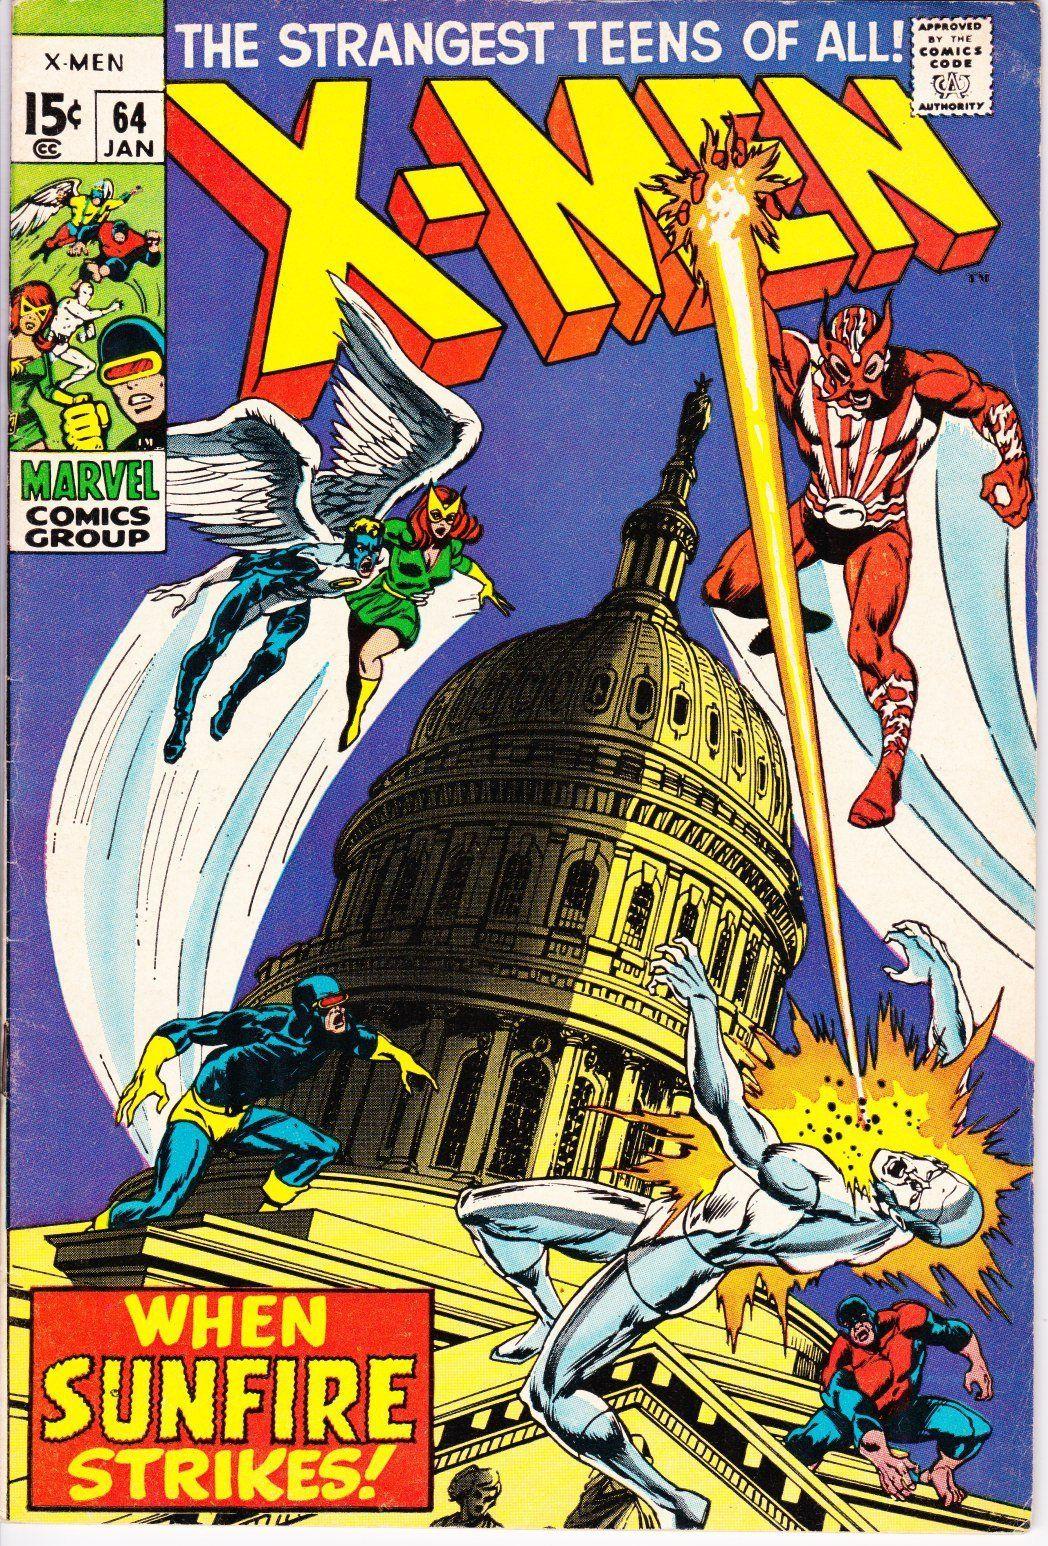 Uncanny X Men 64 1963 1st Series January 1970 Marvel Marvel Comics Covers Marvel Comics Superheroes Comics